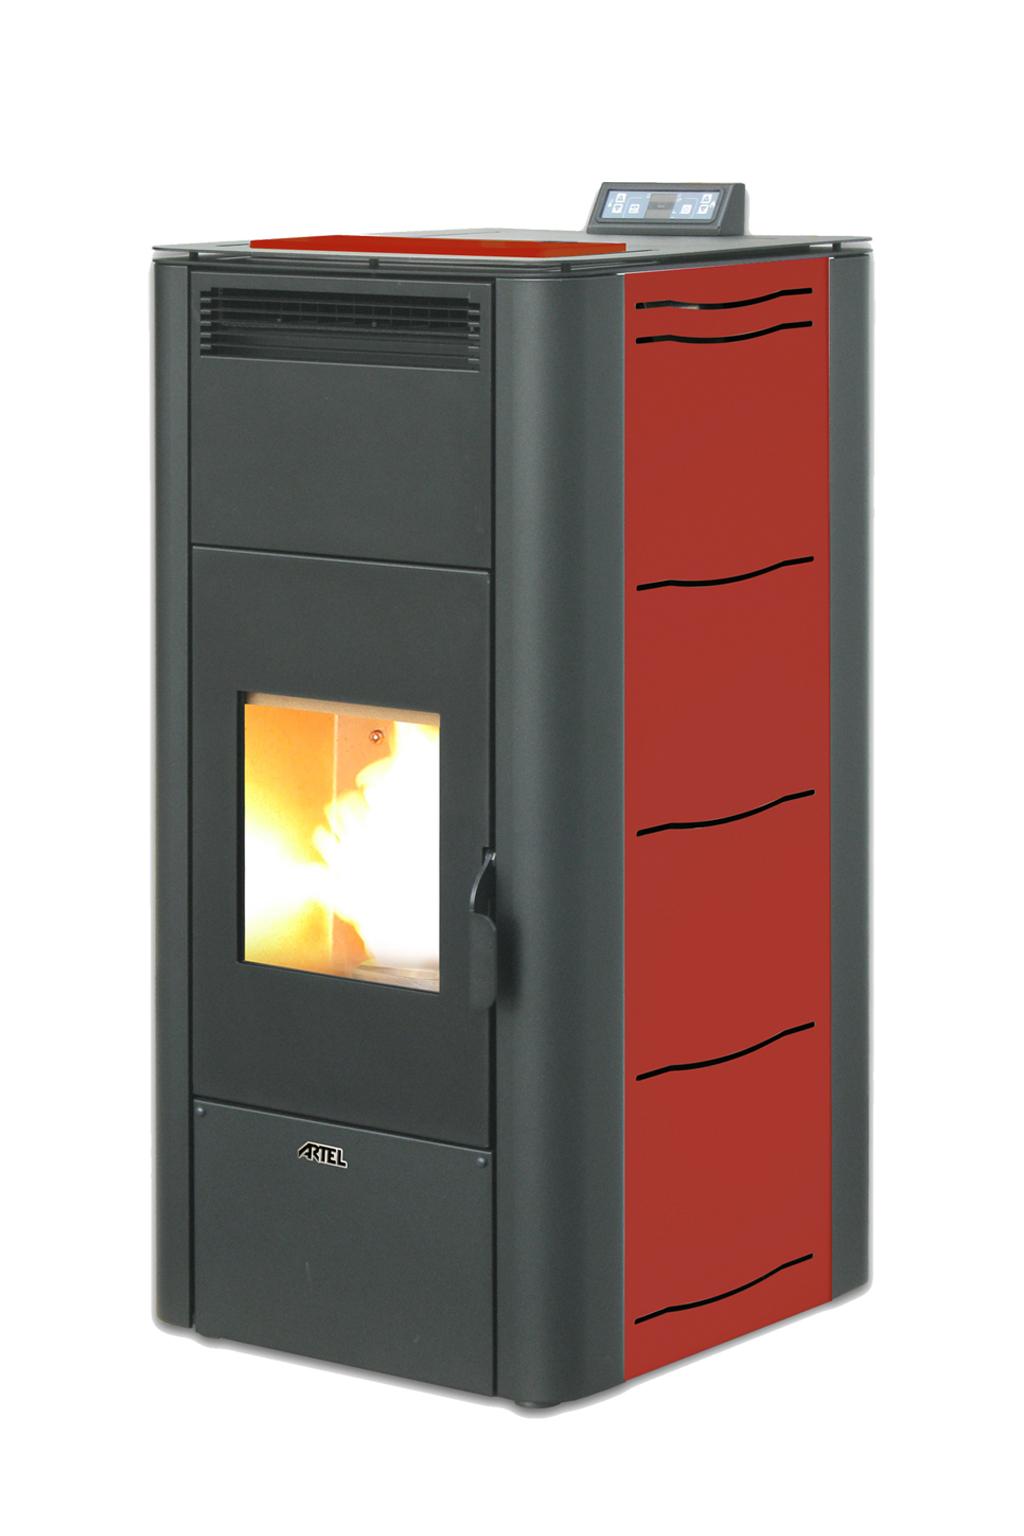 Pelletkachel CV 20 kW rood